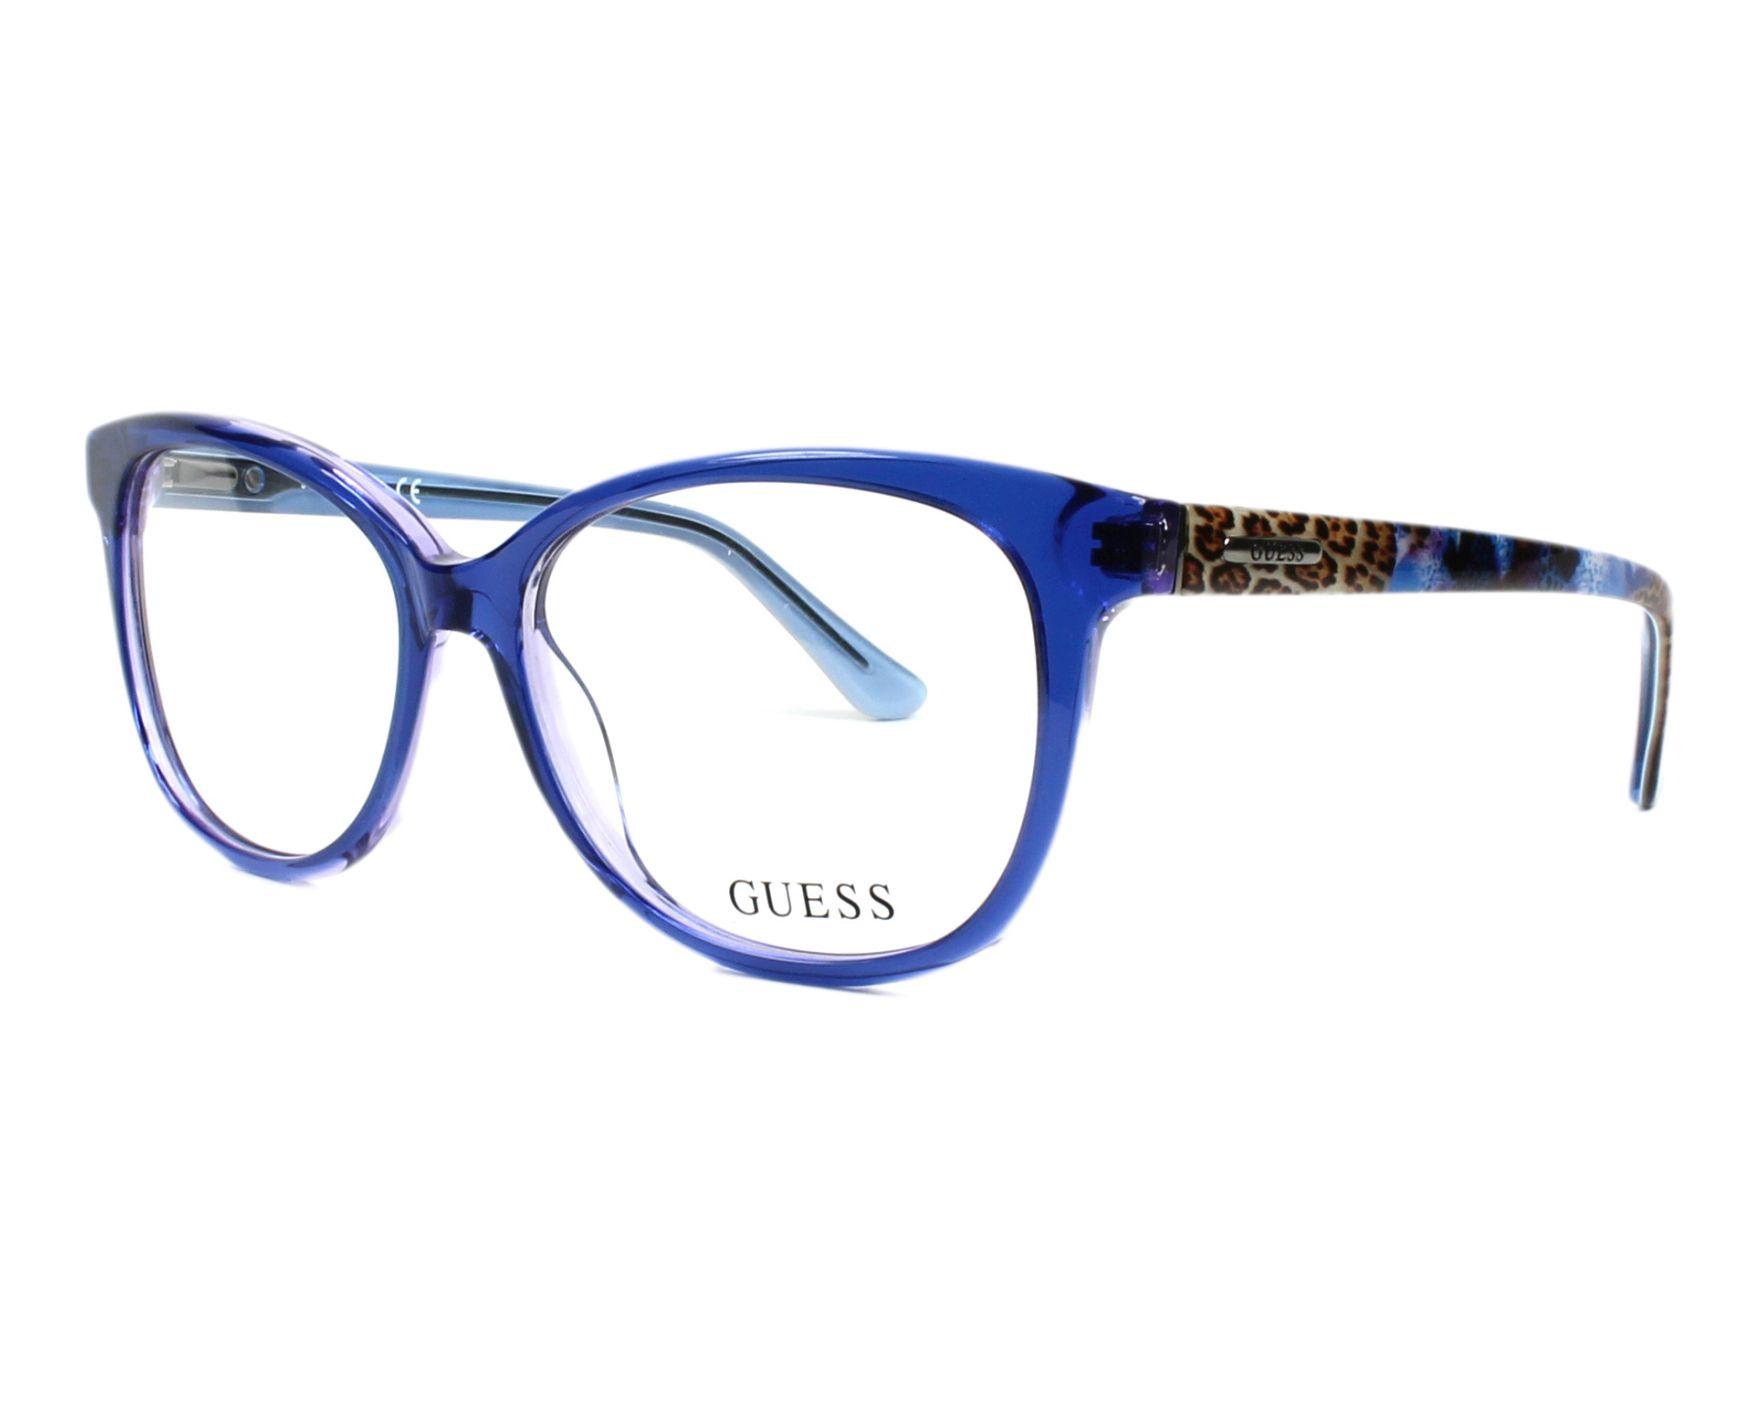 eyeglasses Guess GU-2505 090 52-14 Blue Brown profile view